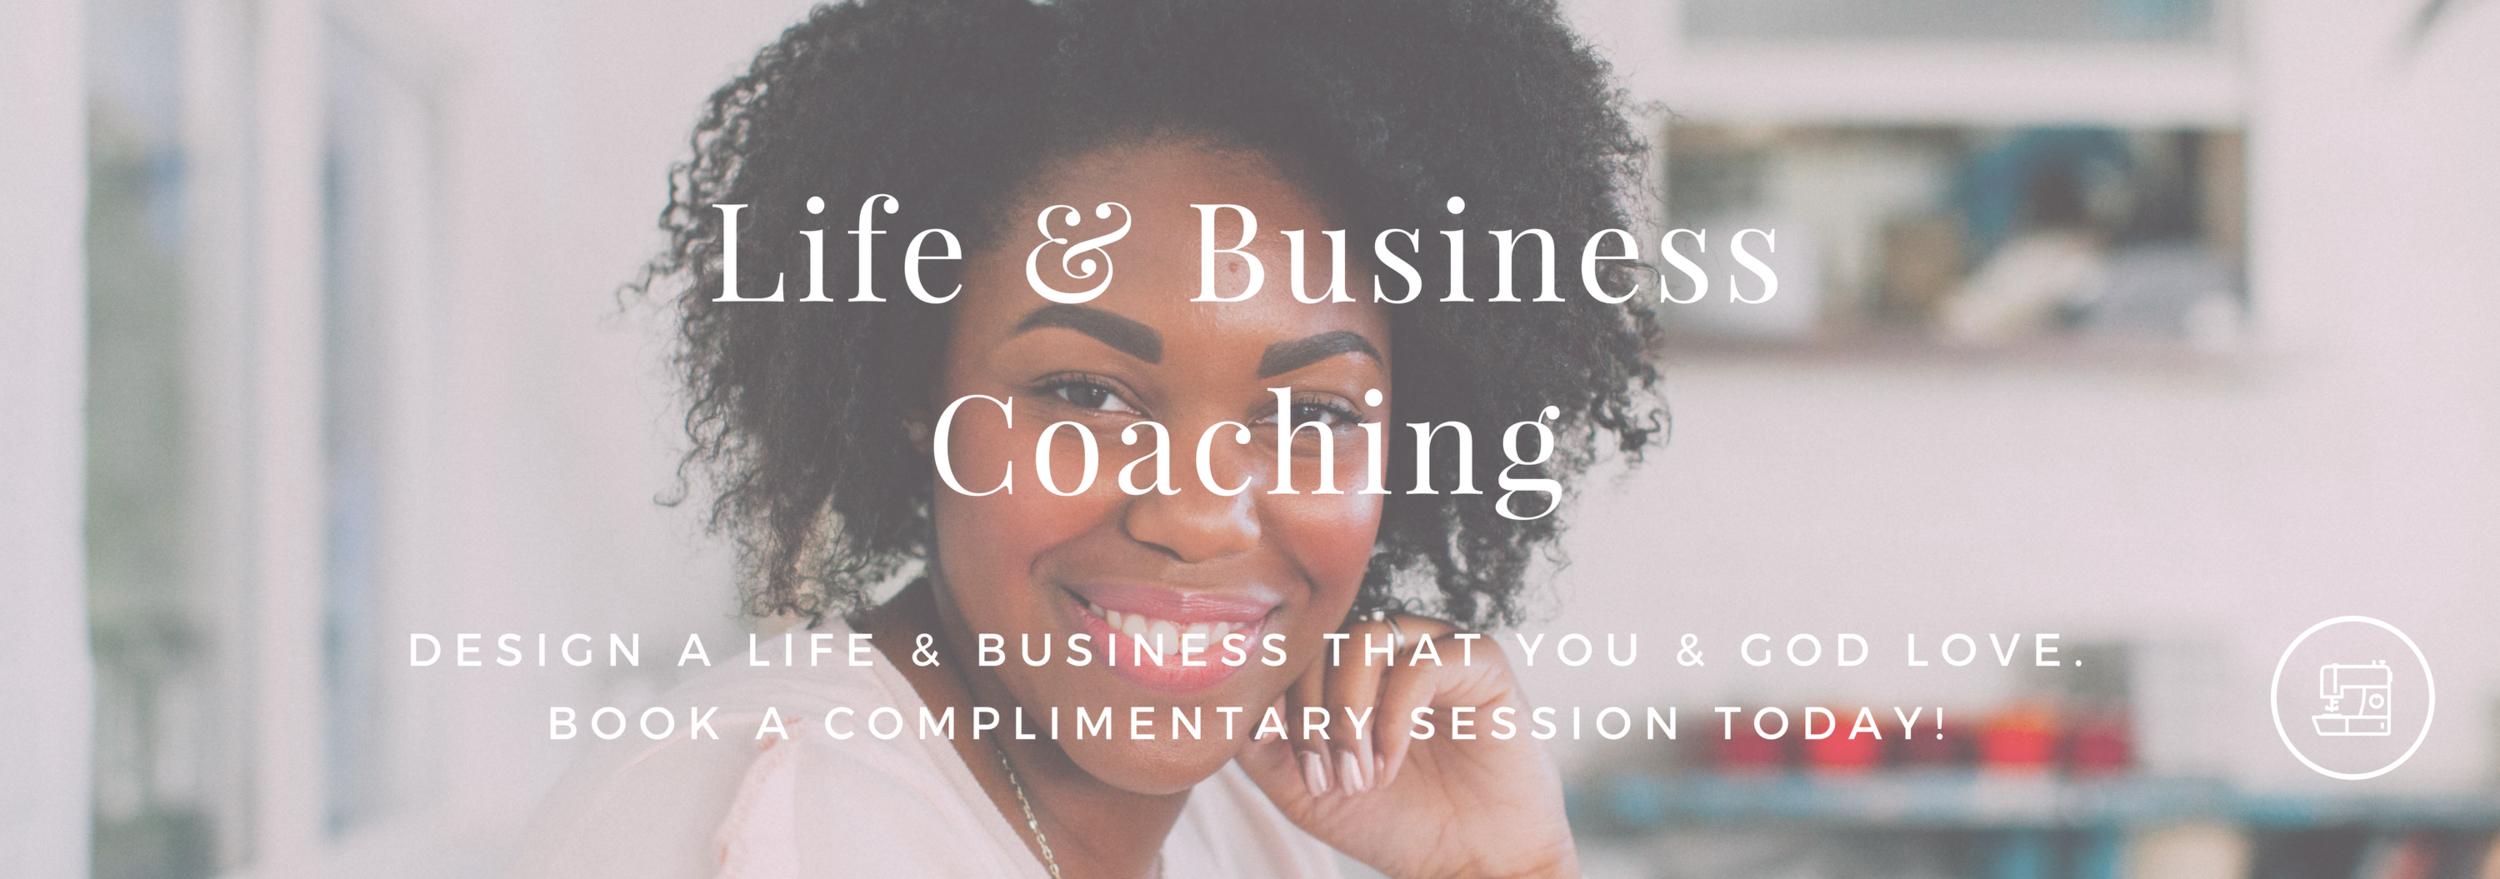 Coaching Blog Post Ad (1).png